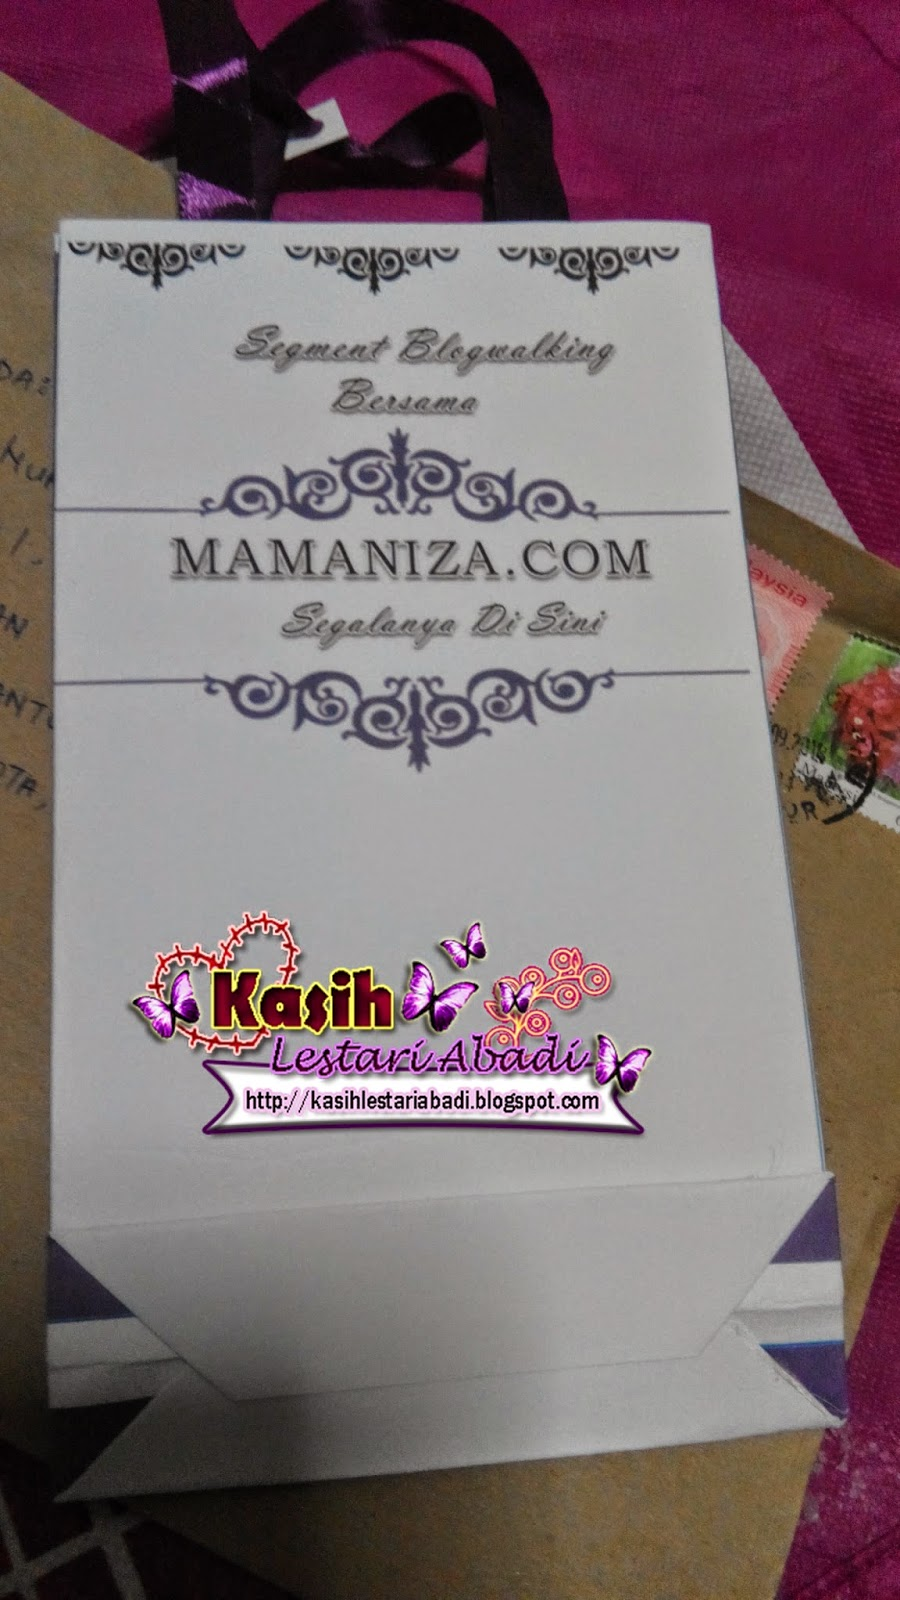 Hadiah Giveaway Mamaniza.com,Giveaway,segmen,hadiah,Mamaniza.com